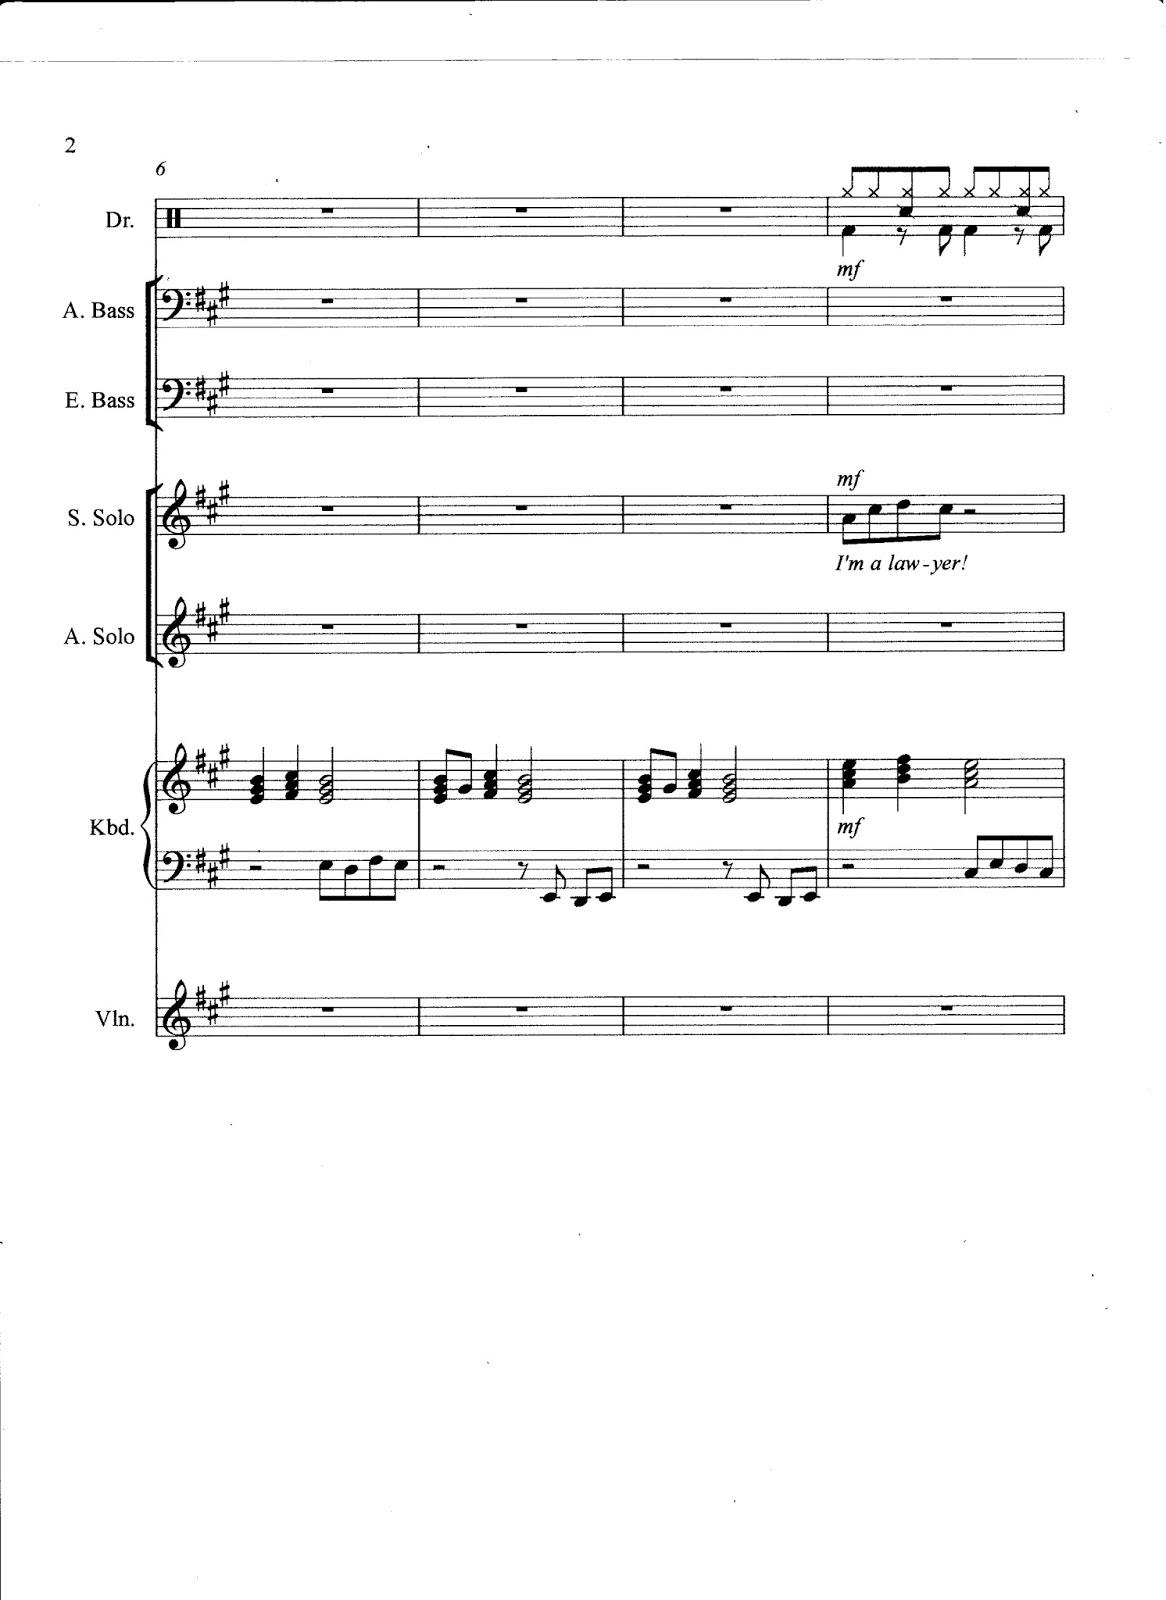 Week 20 Brainstorming Ideas For The Script My Epq Drum Set Diagrams At Americanmusical Score